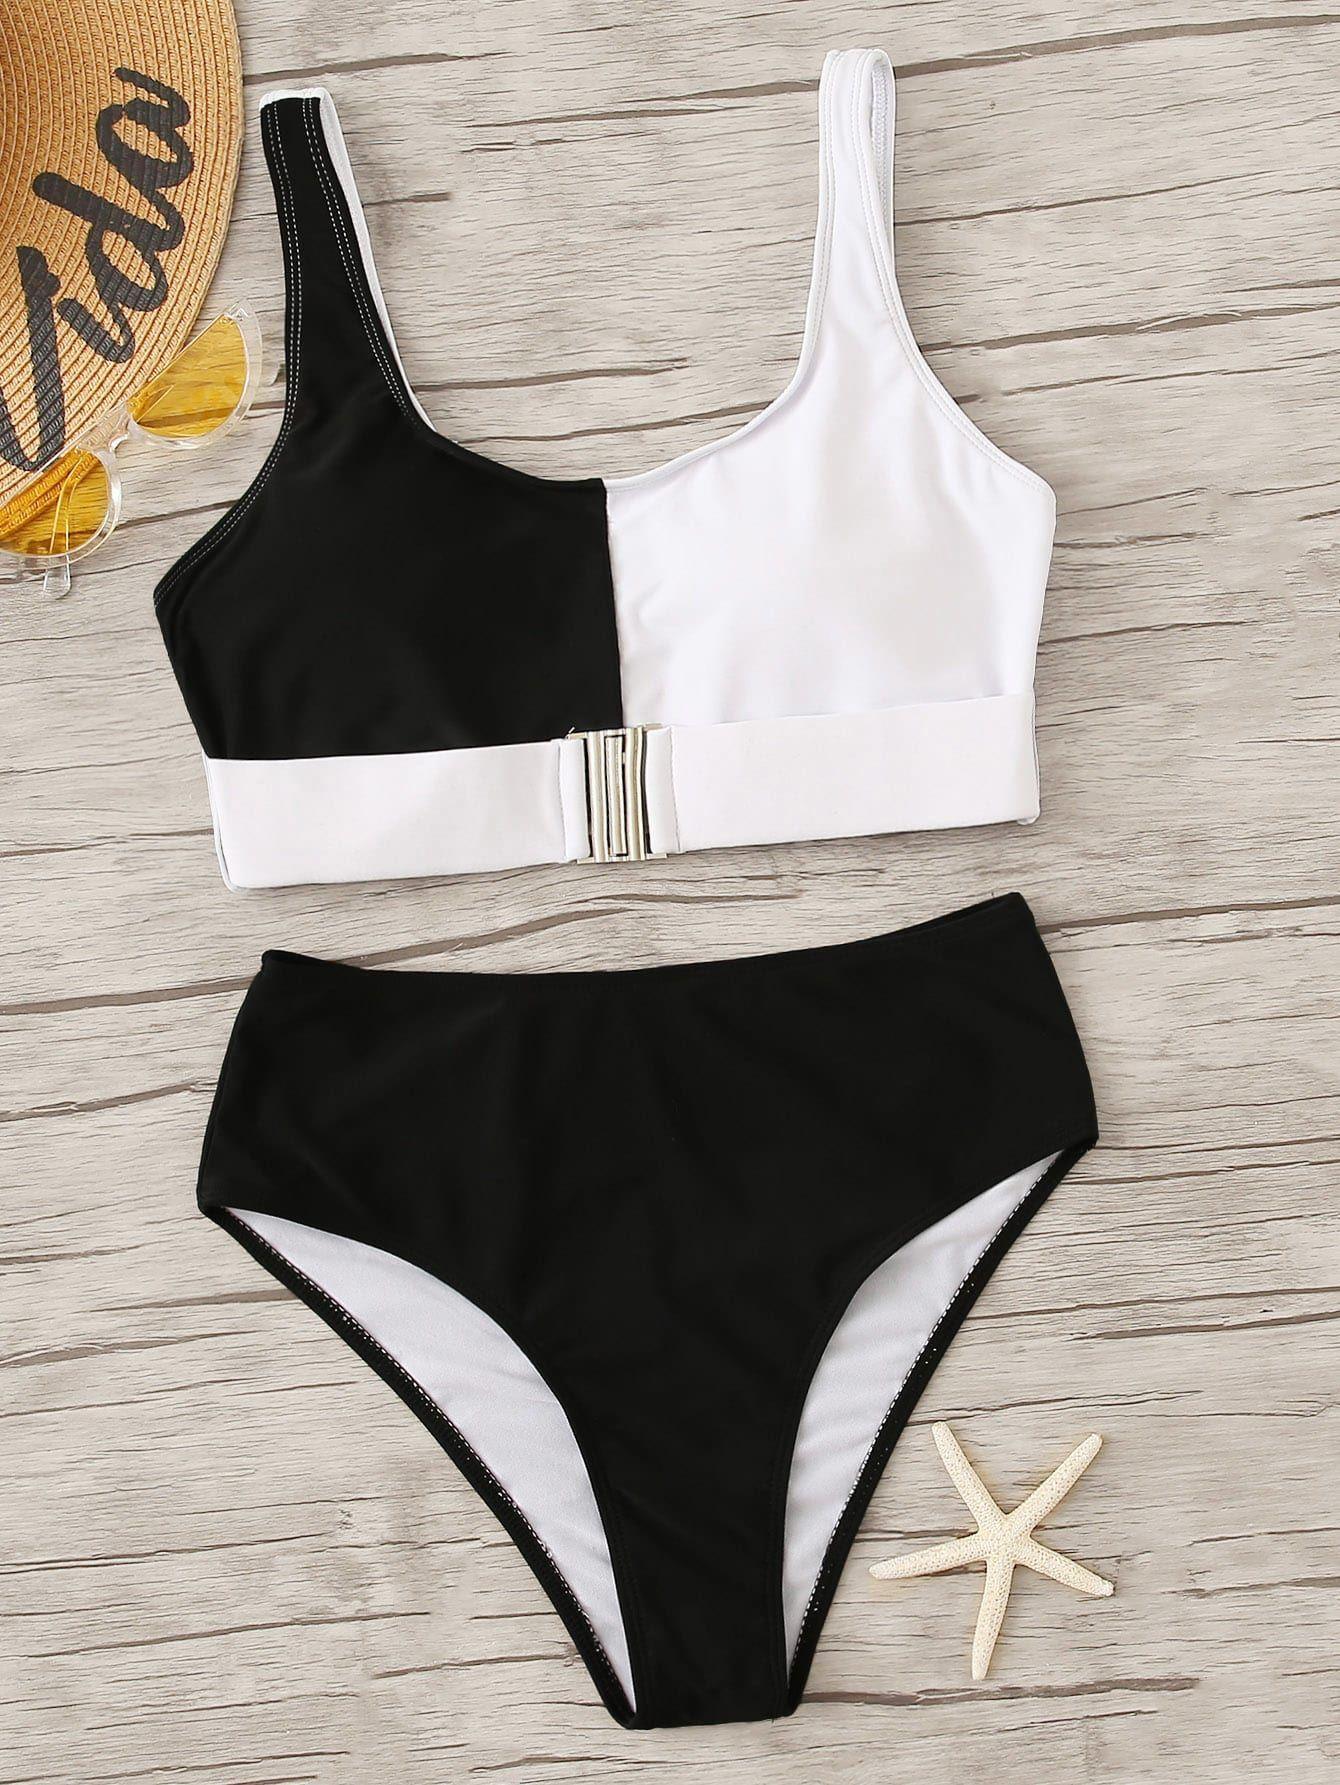 1459b163dc Cut And Sew Buckle Front Top With High Waist Bikini #dress #woman #fashion